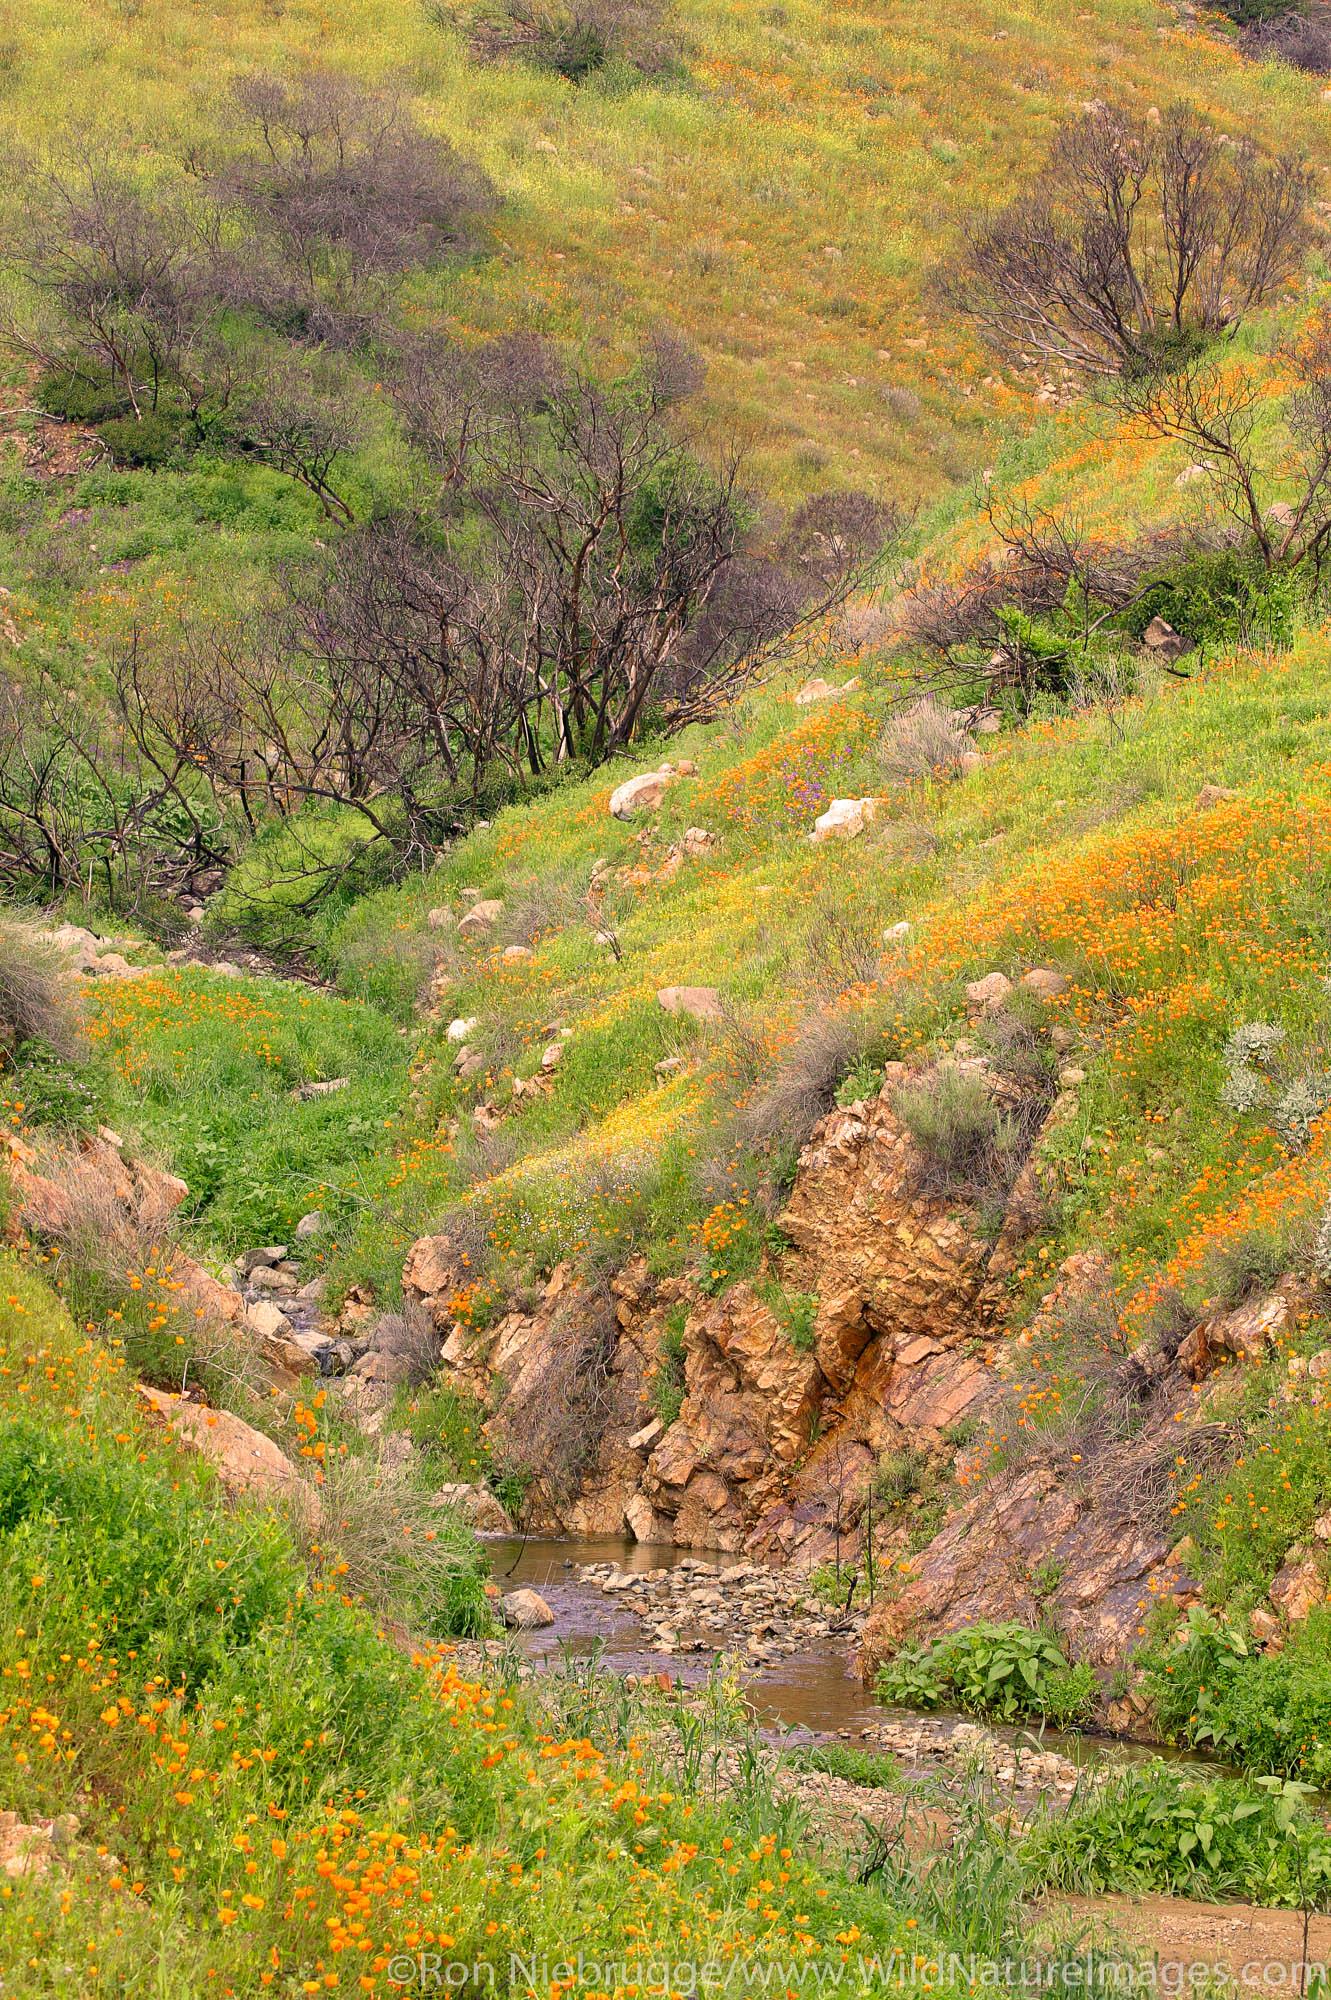 Spring wildflowers near Lake Elsinore, California.